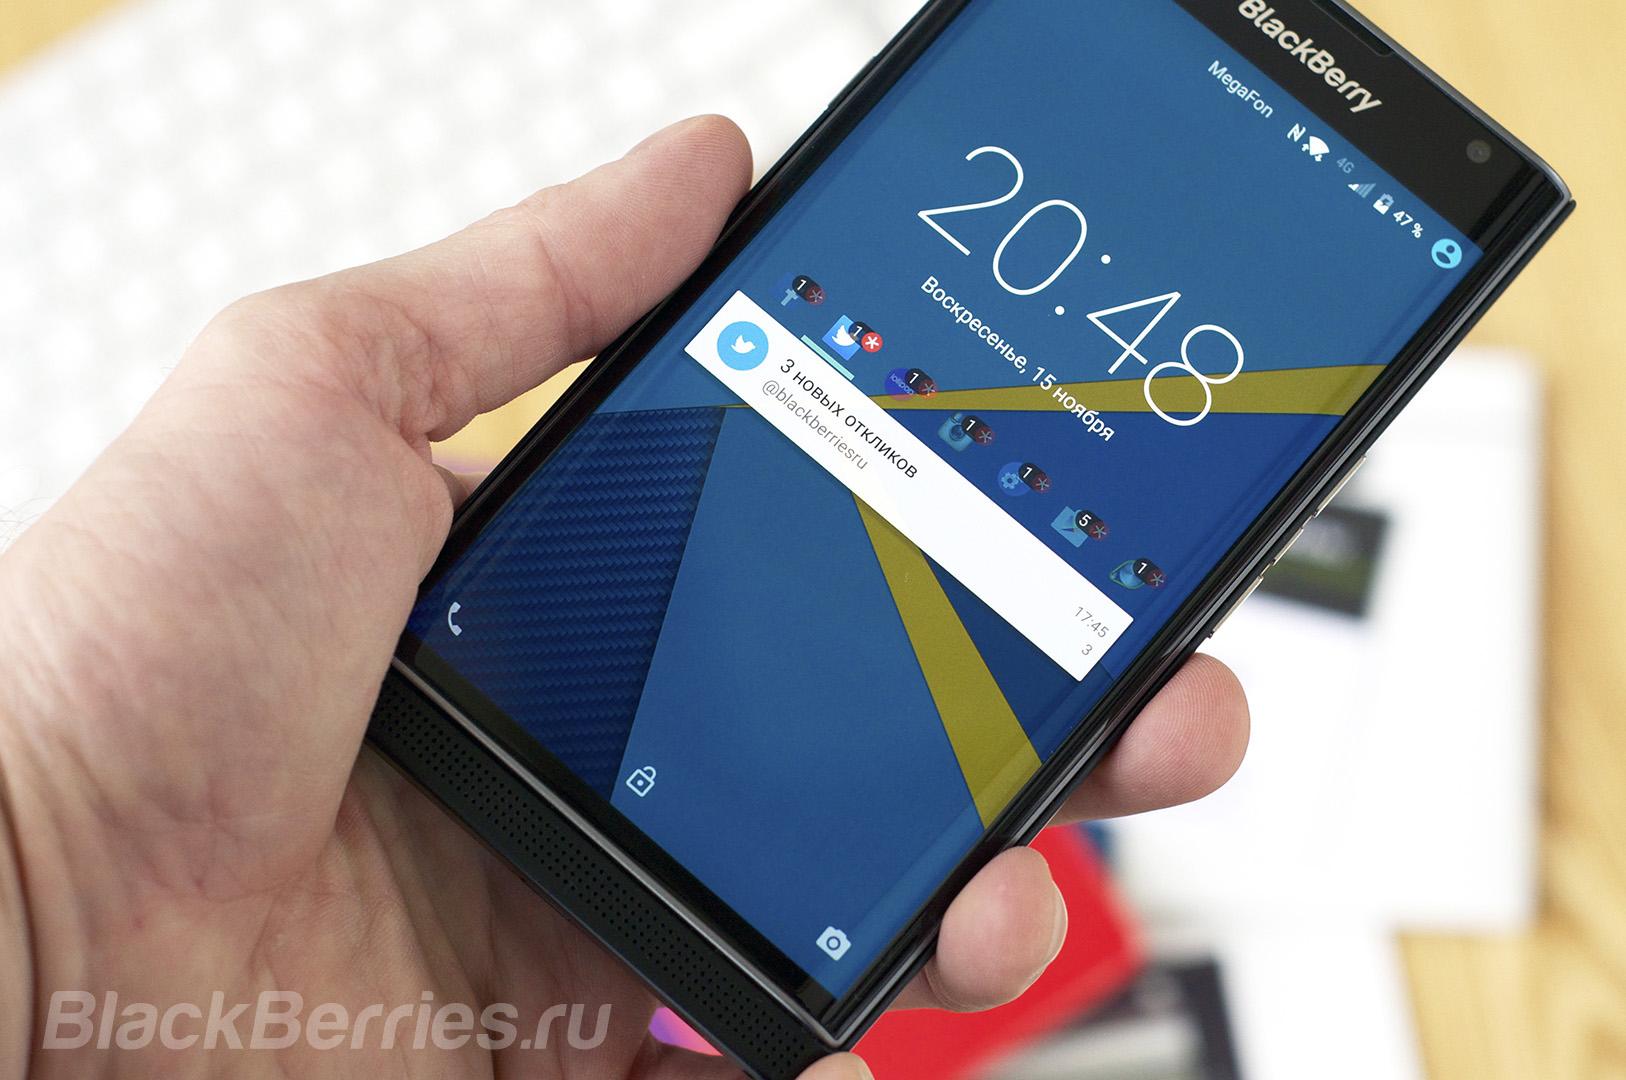 BlackBerry-Priv-Review-025